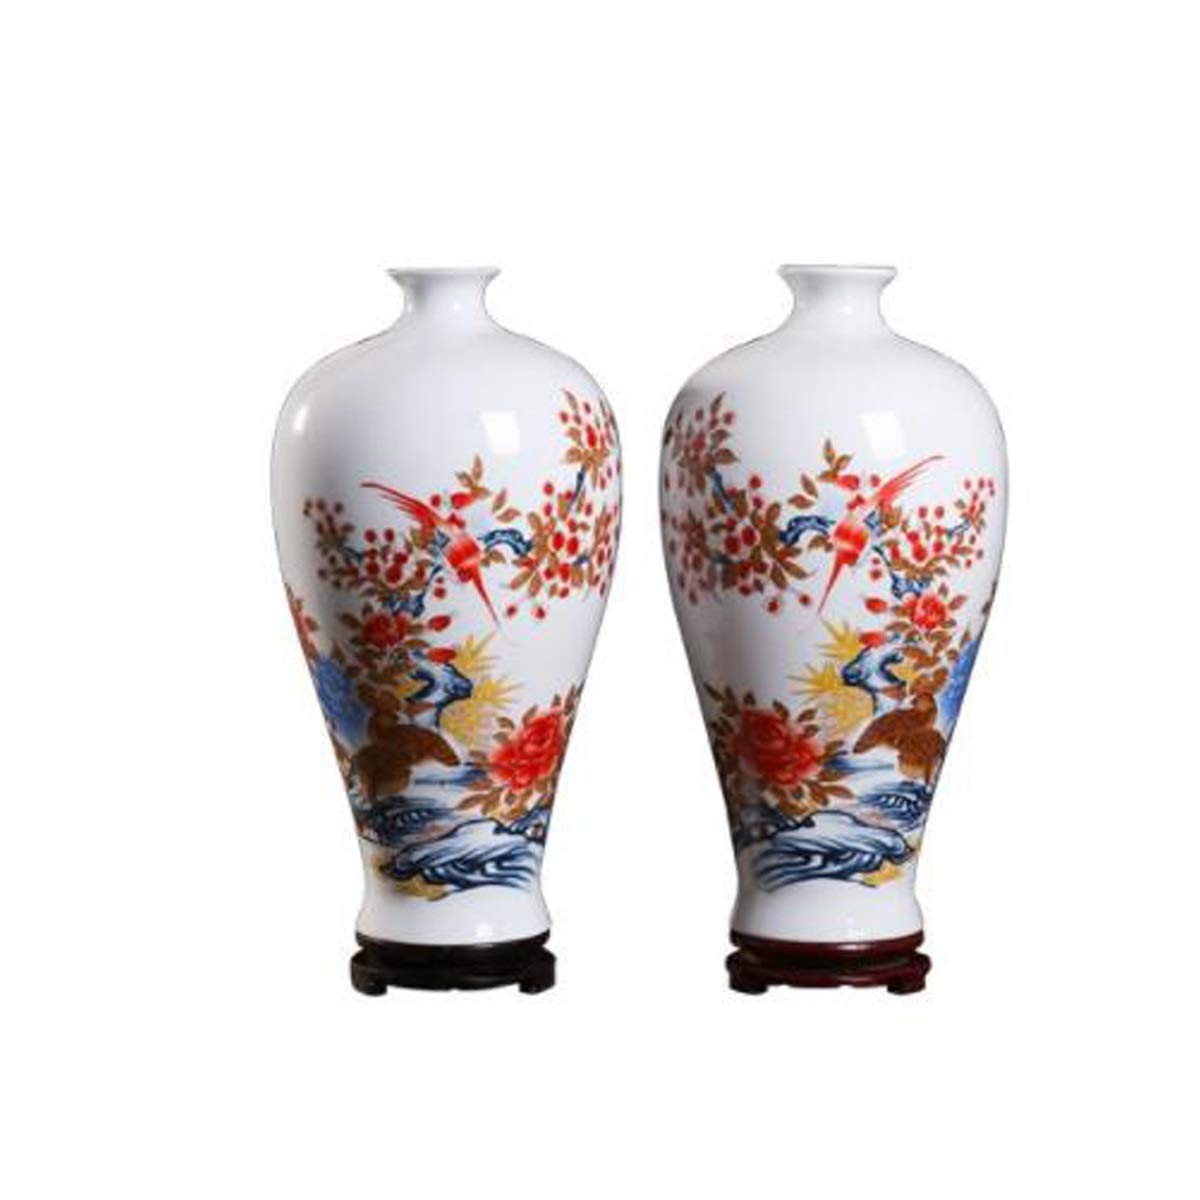 8HAOWENJU 花瓶の装飾、景徳鎮のセラミック花瓶の装飾、磁器の瓶のリッチ牡丹のペア、室内装飾、モダンなホームTVのキャビネット、カウンタートップの装飾、ワインのキャビネット、ポーチの家具、中国のリビングルーム 中華風 (UnitCount : A pair) B07SQNX5VV  A pair